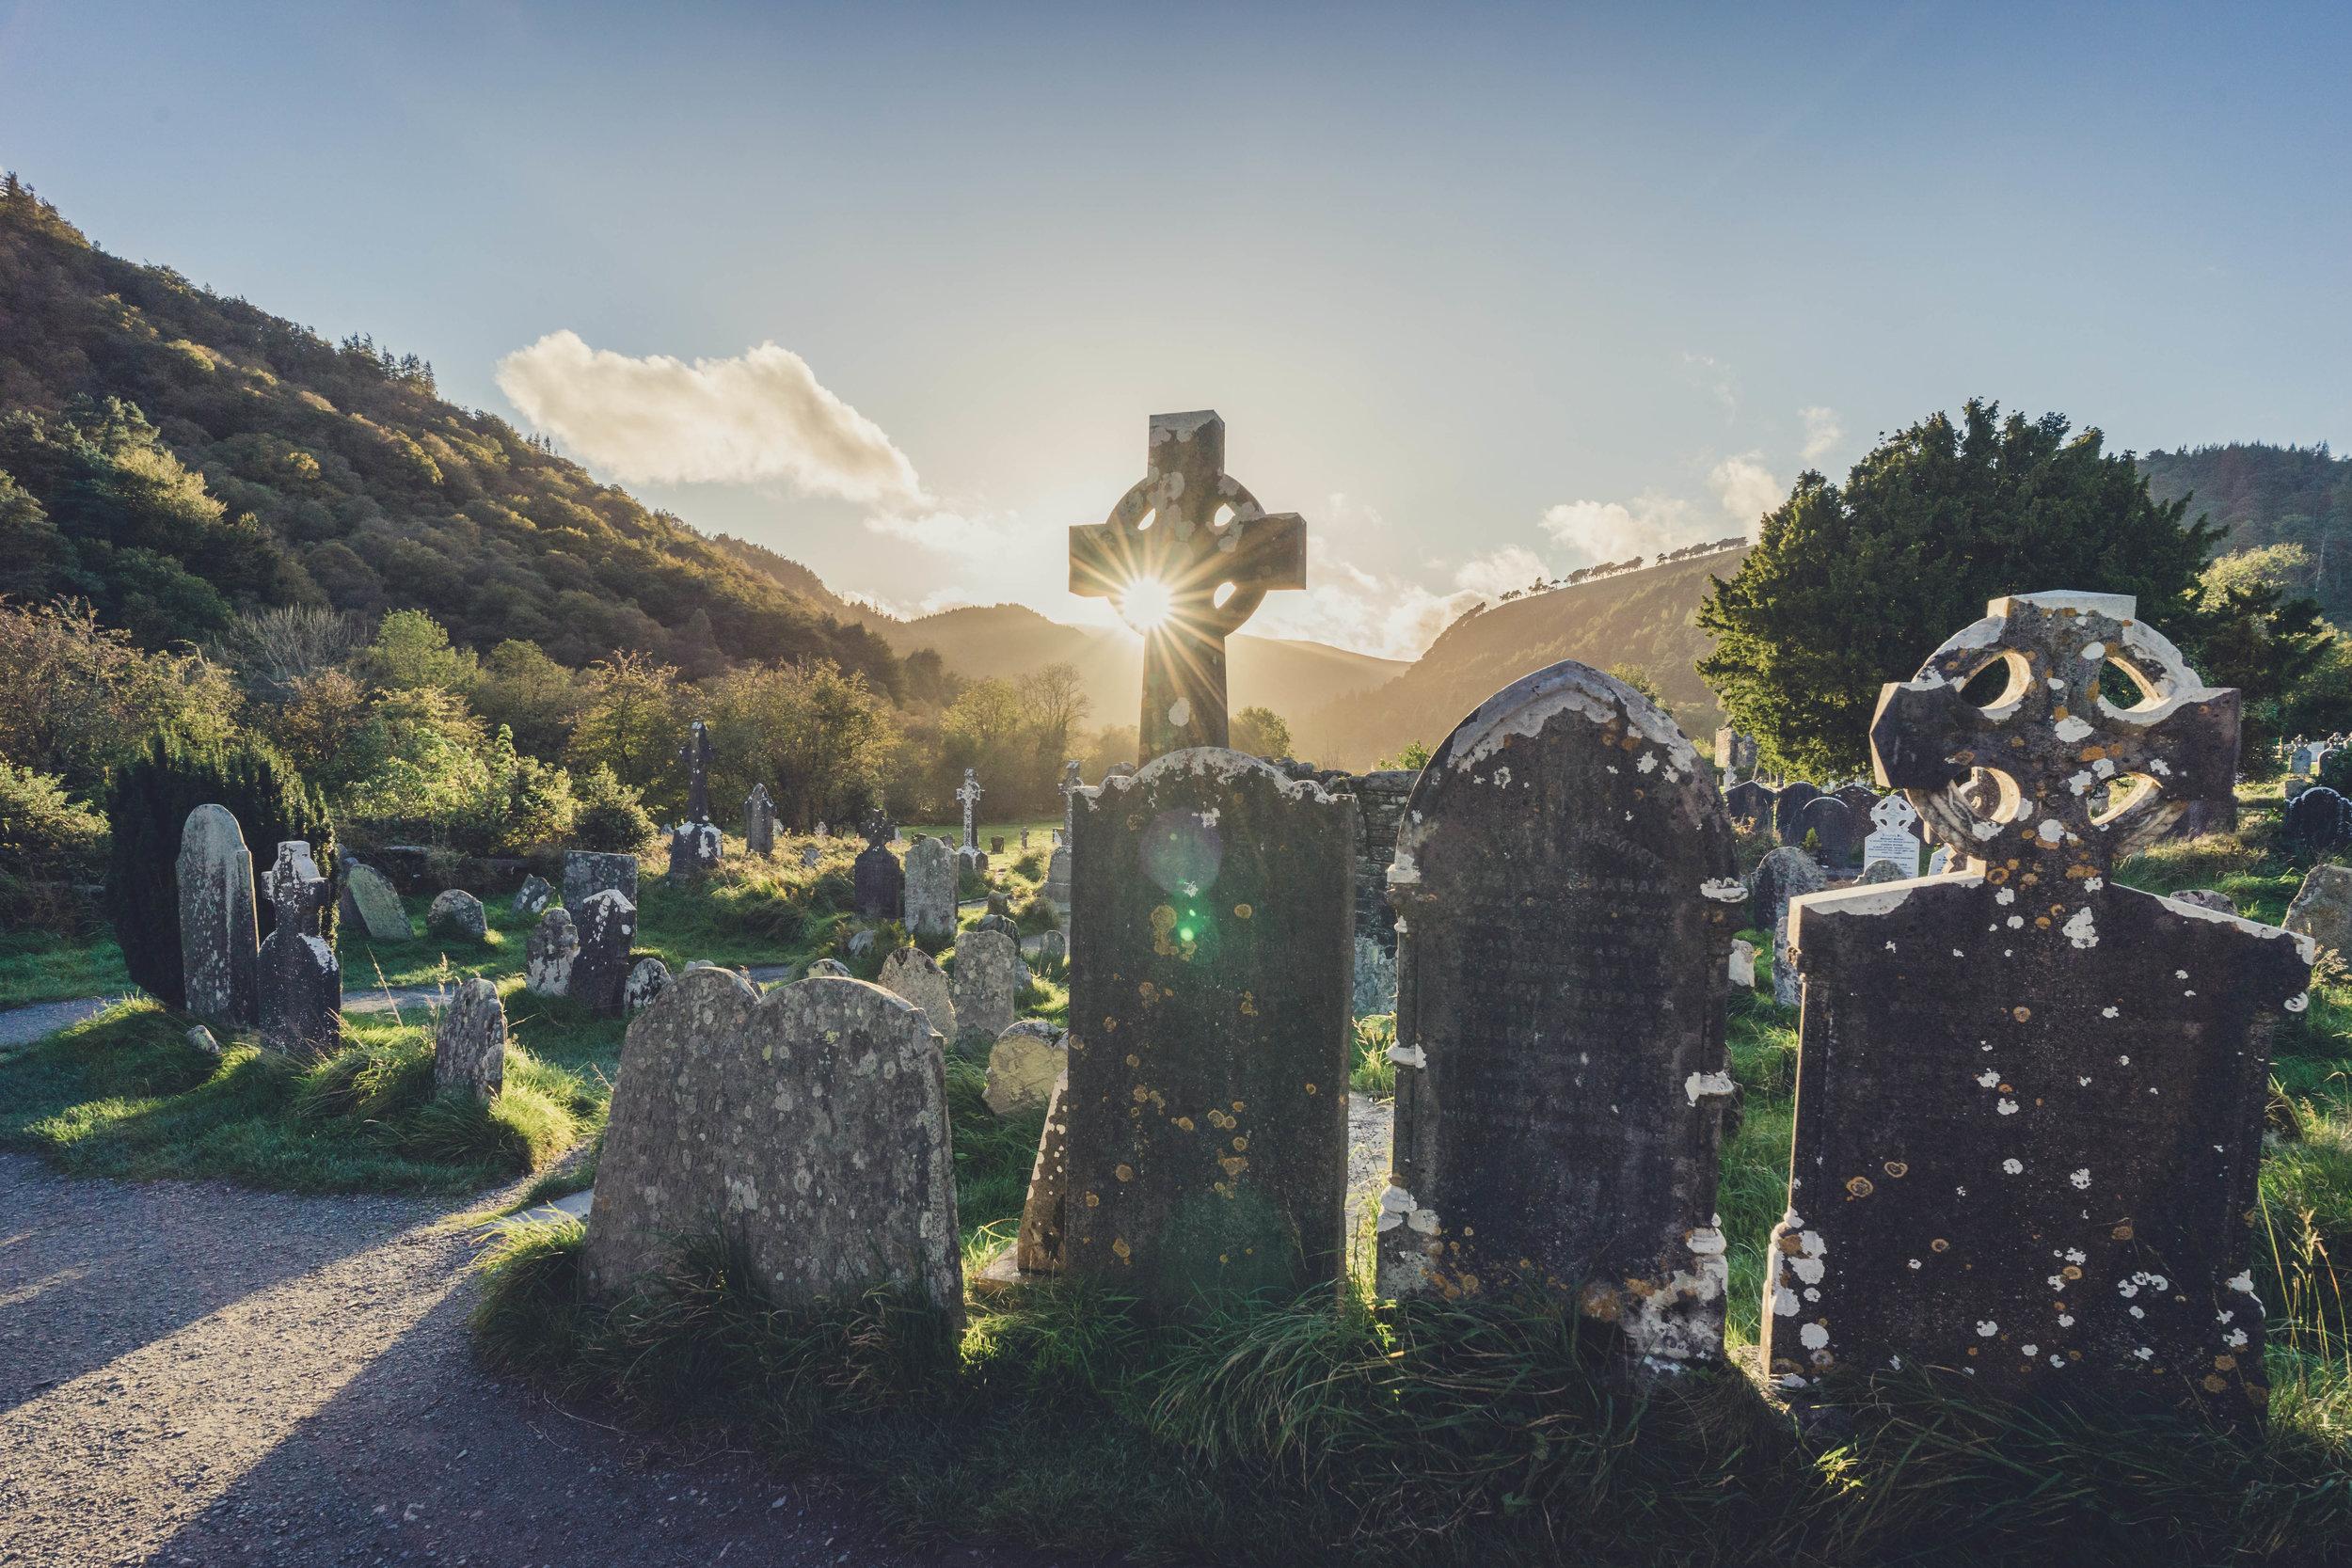 glendalough. irish history. county wicklow. round tower. hill walknig. hiking. grave yard. wildlife. tombstones. lakes. blue sky. sunlight peering through.jpg